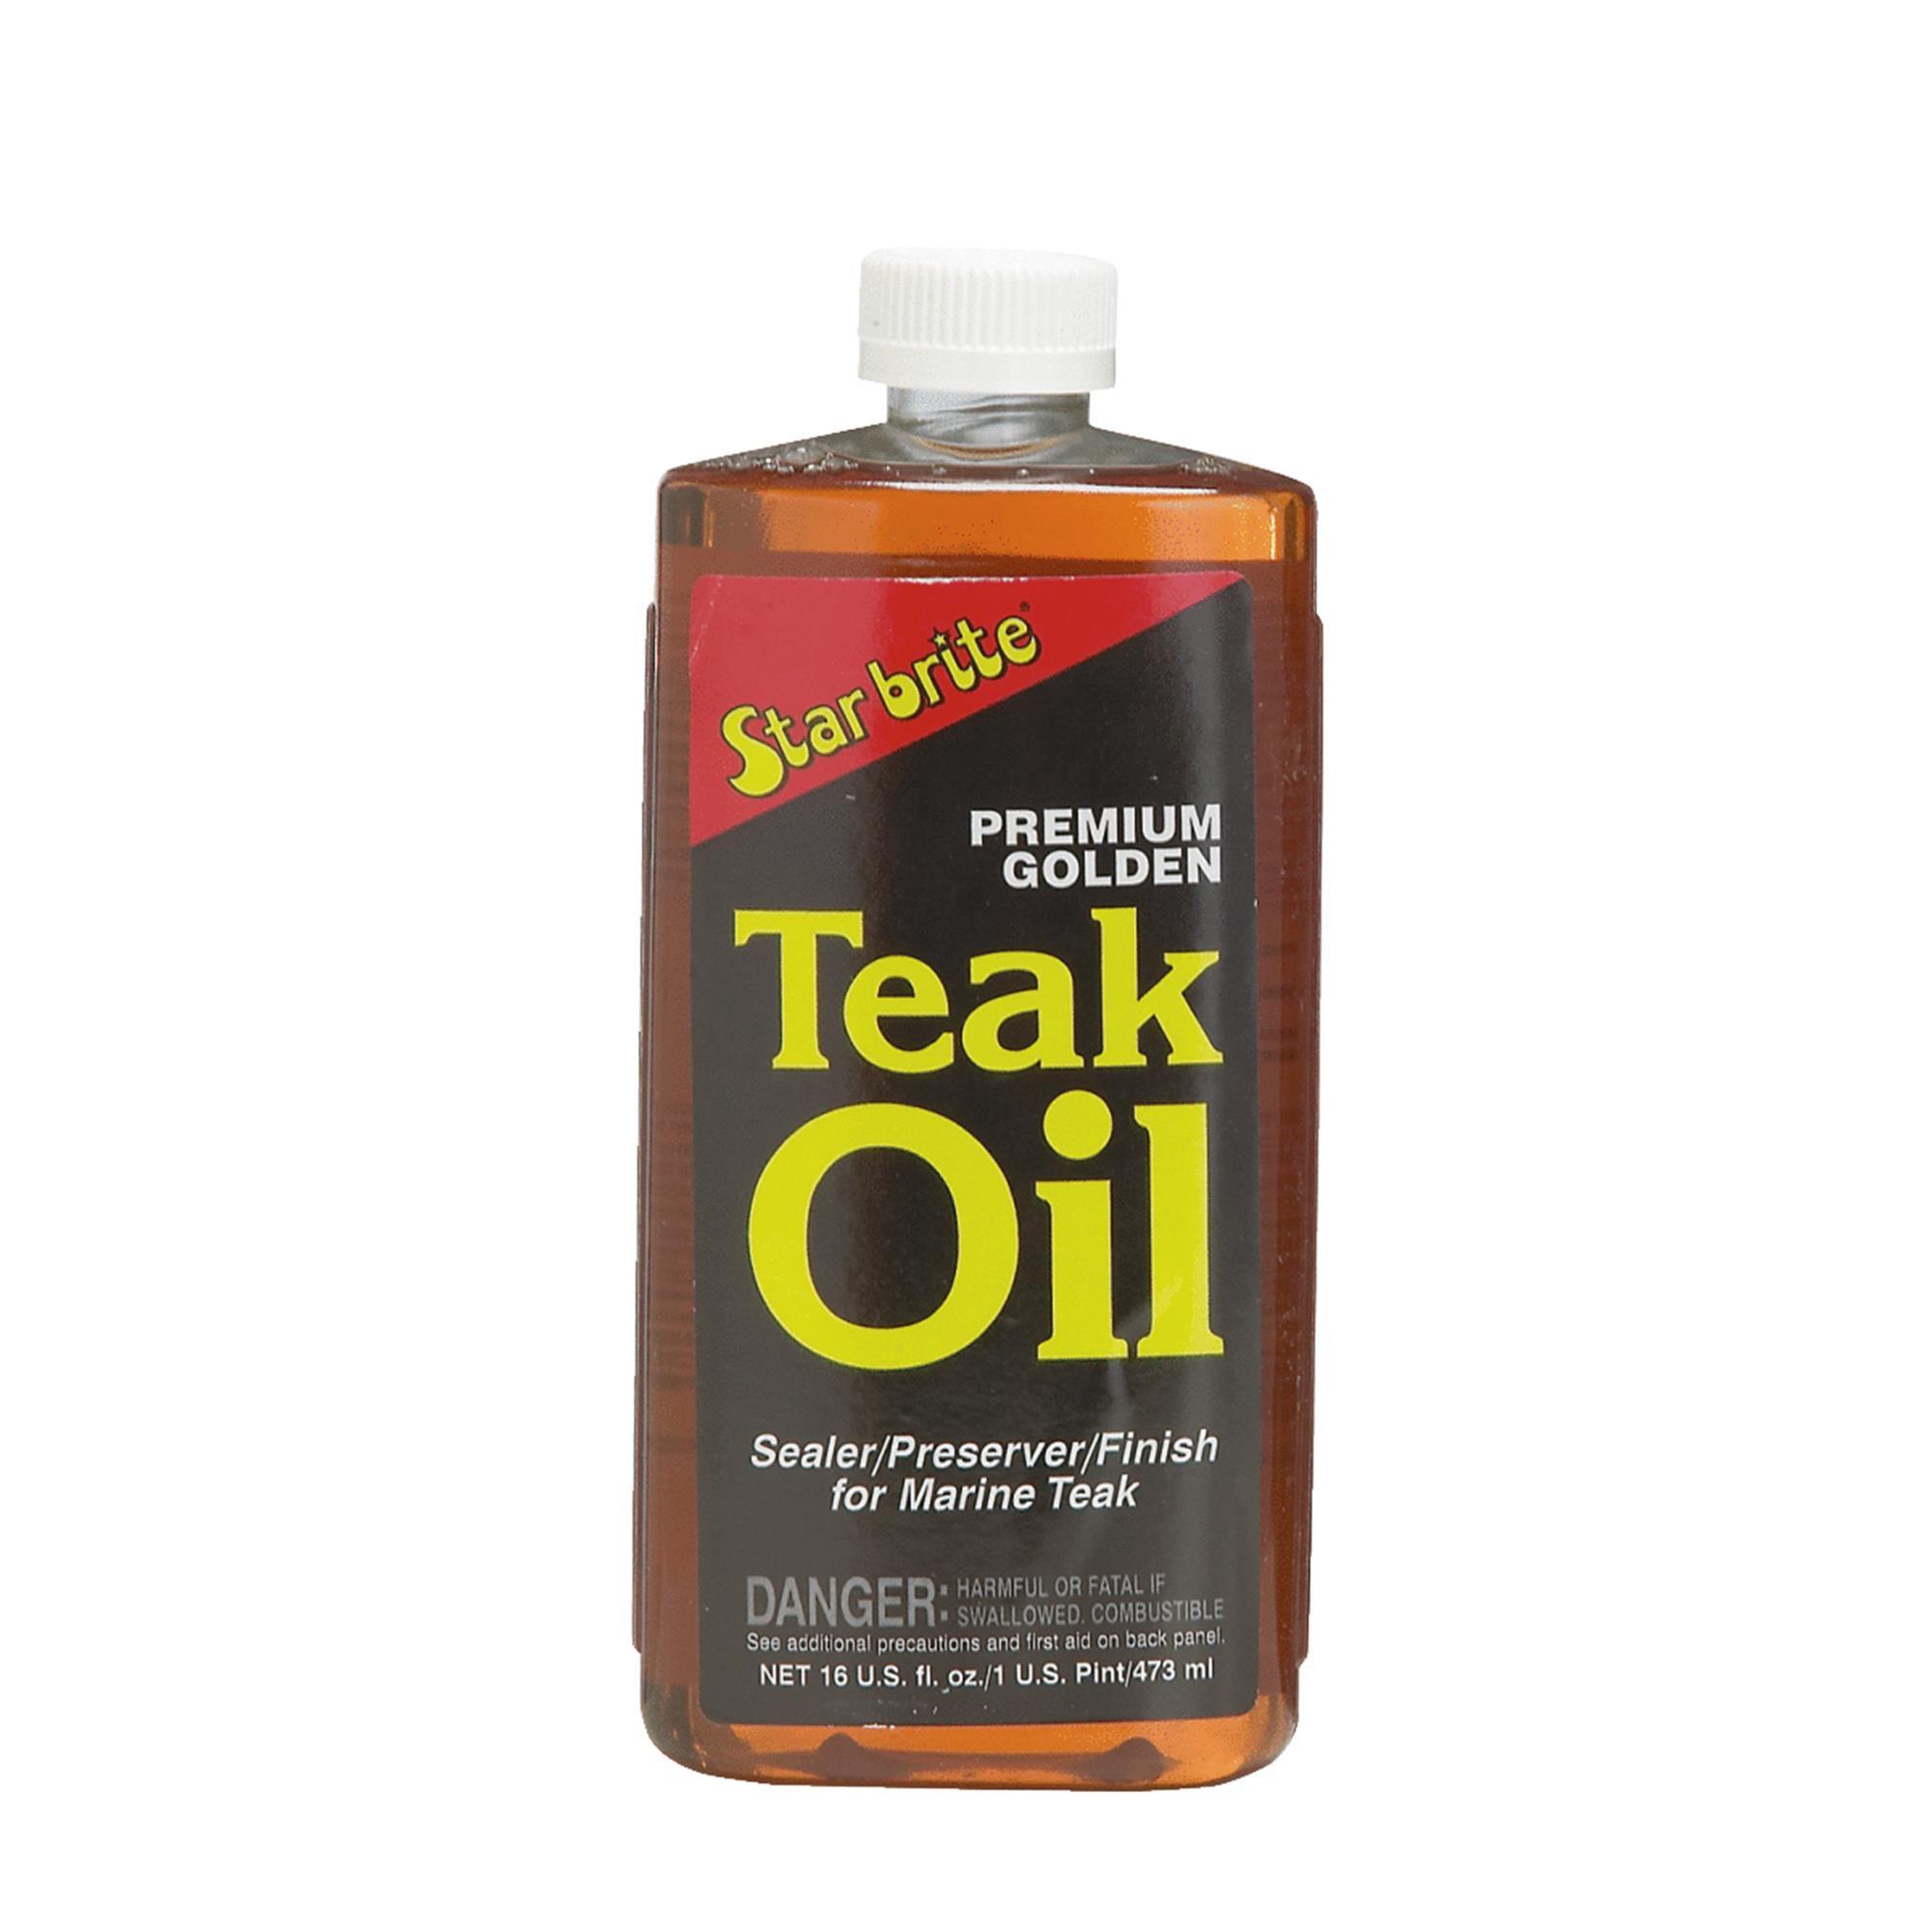 Starbrite Premium Golden Teak Oil Finish